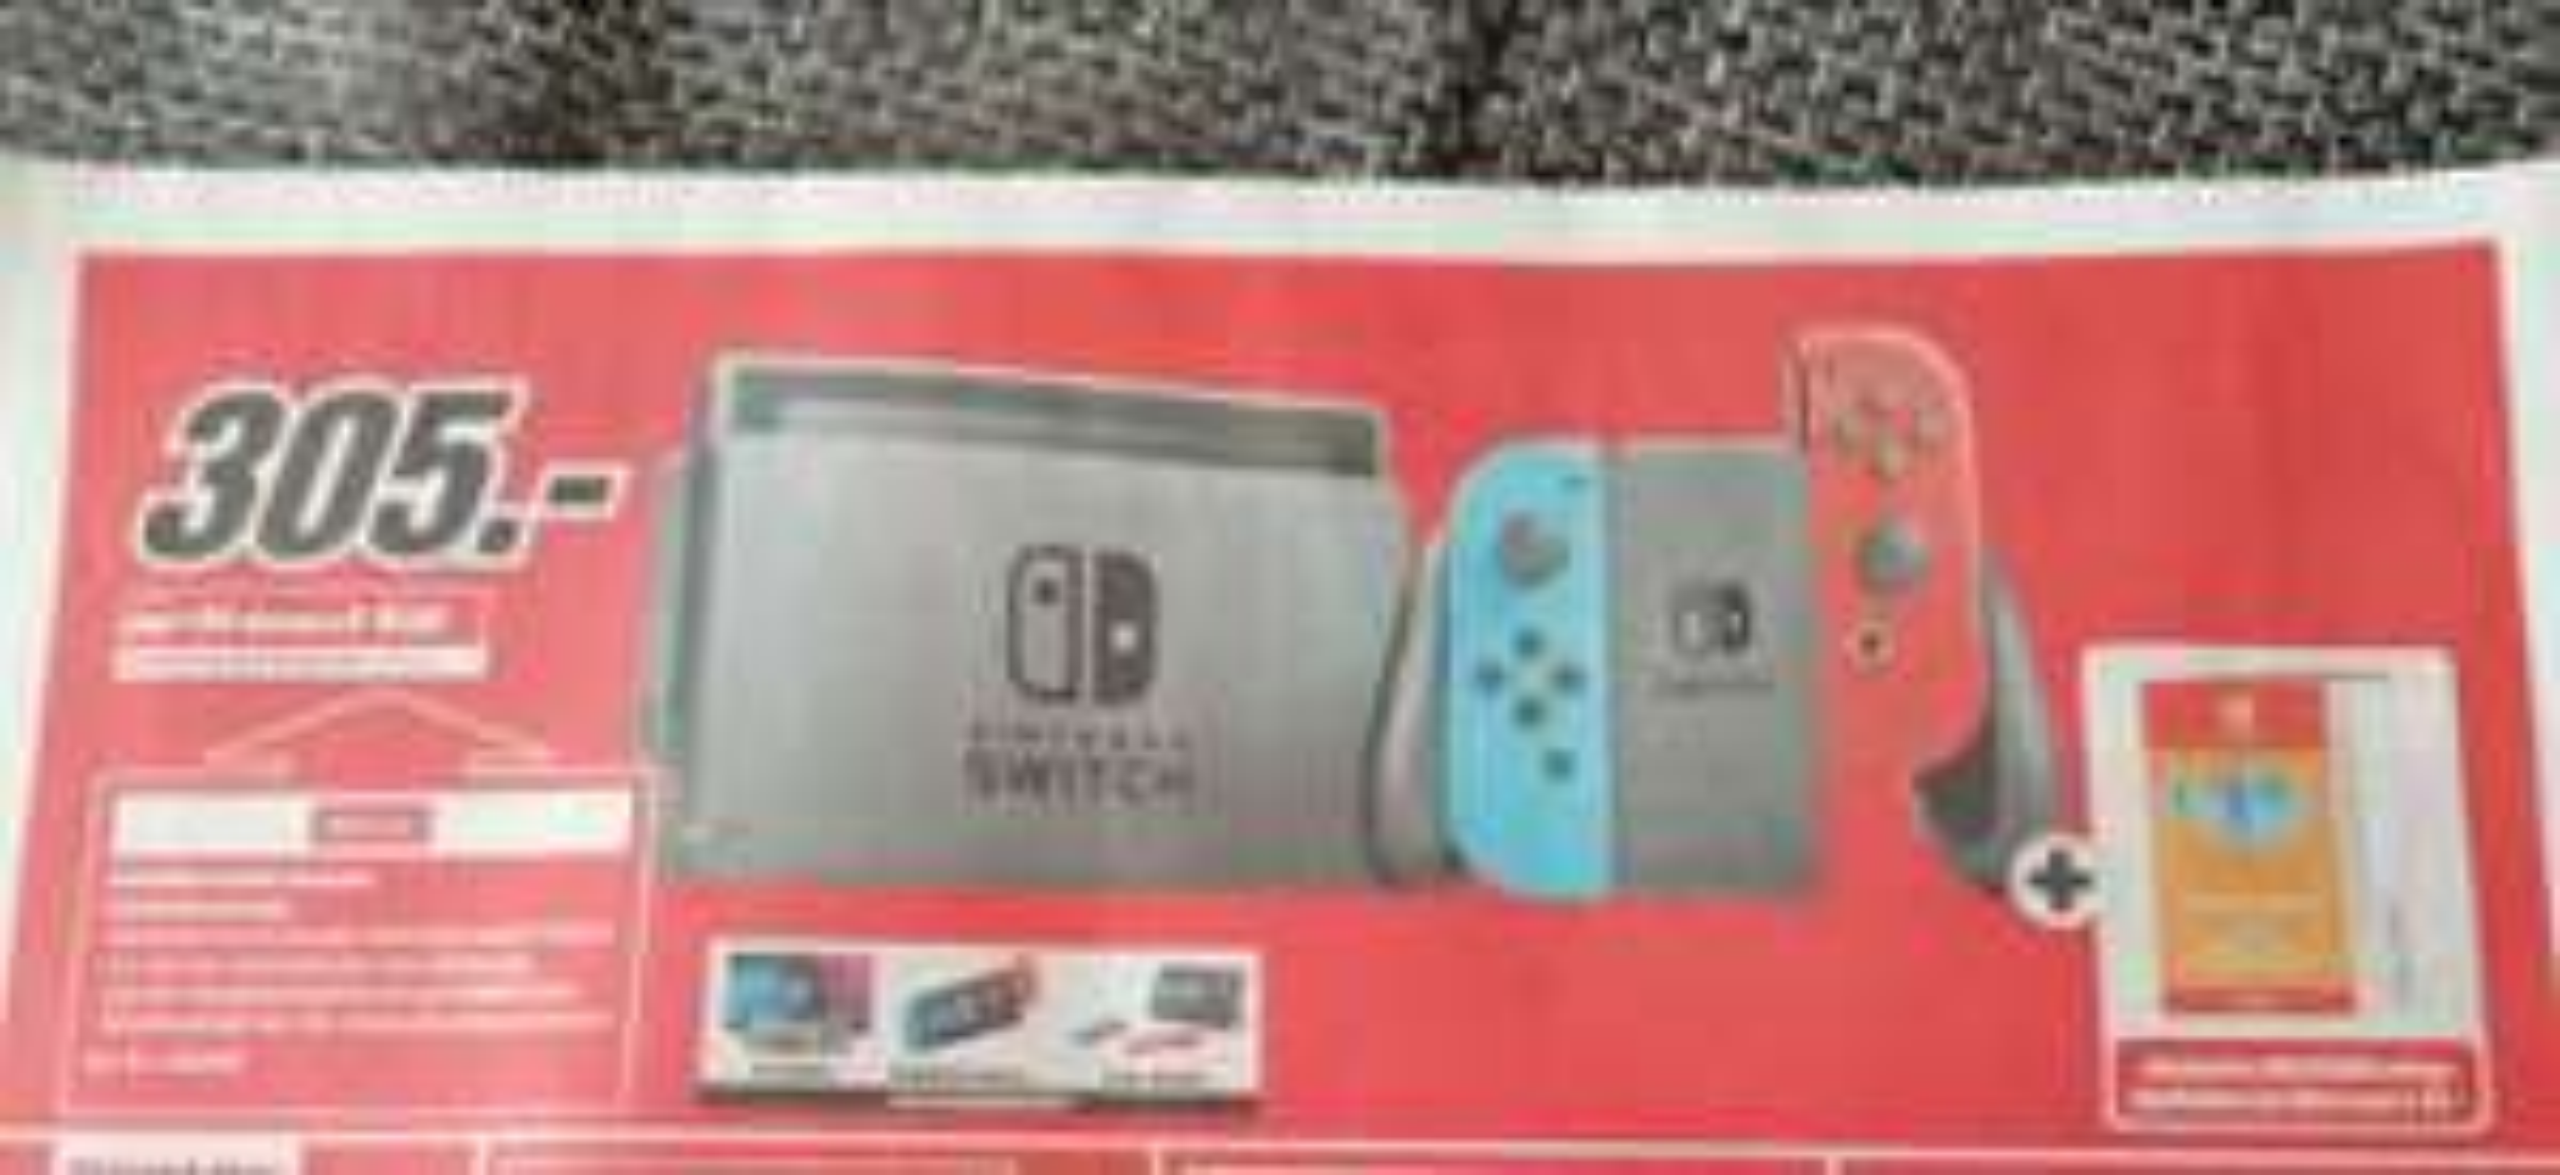 Lokal Krefeld Nintendo Switch inkl. 35 € eShop Guthaben